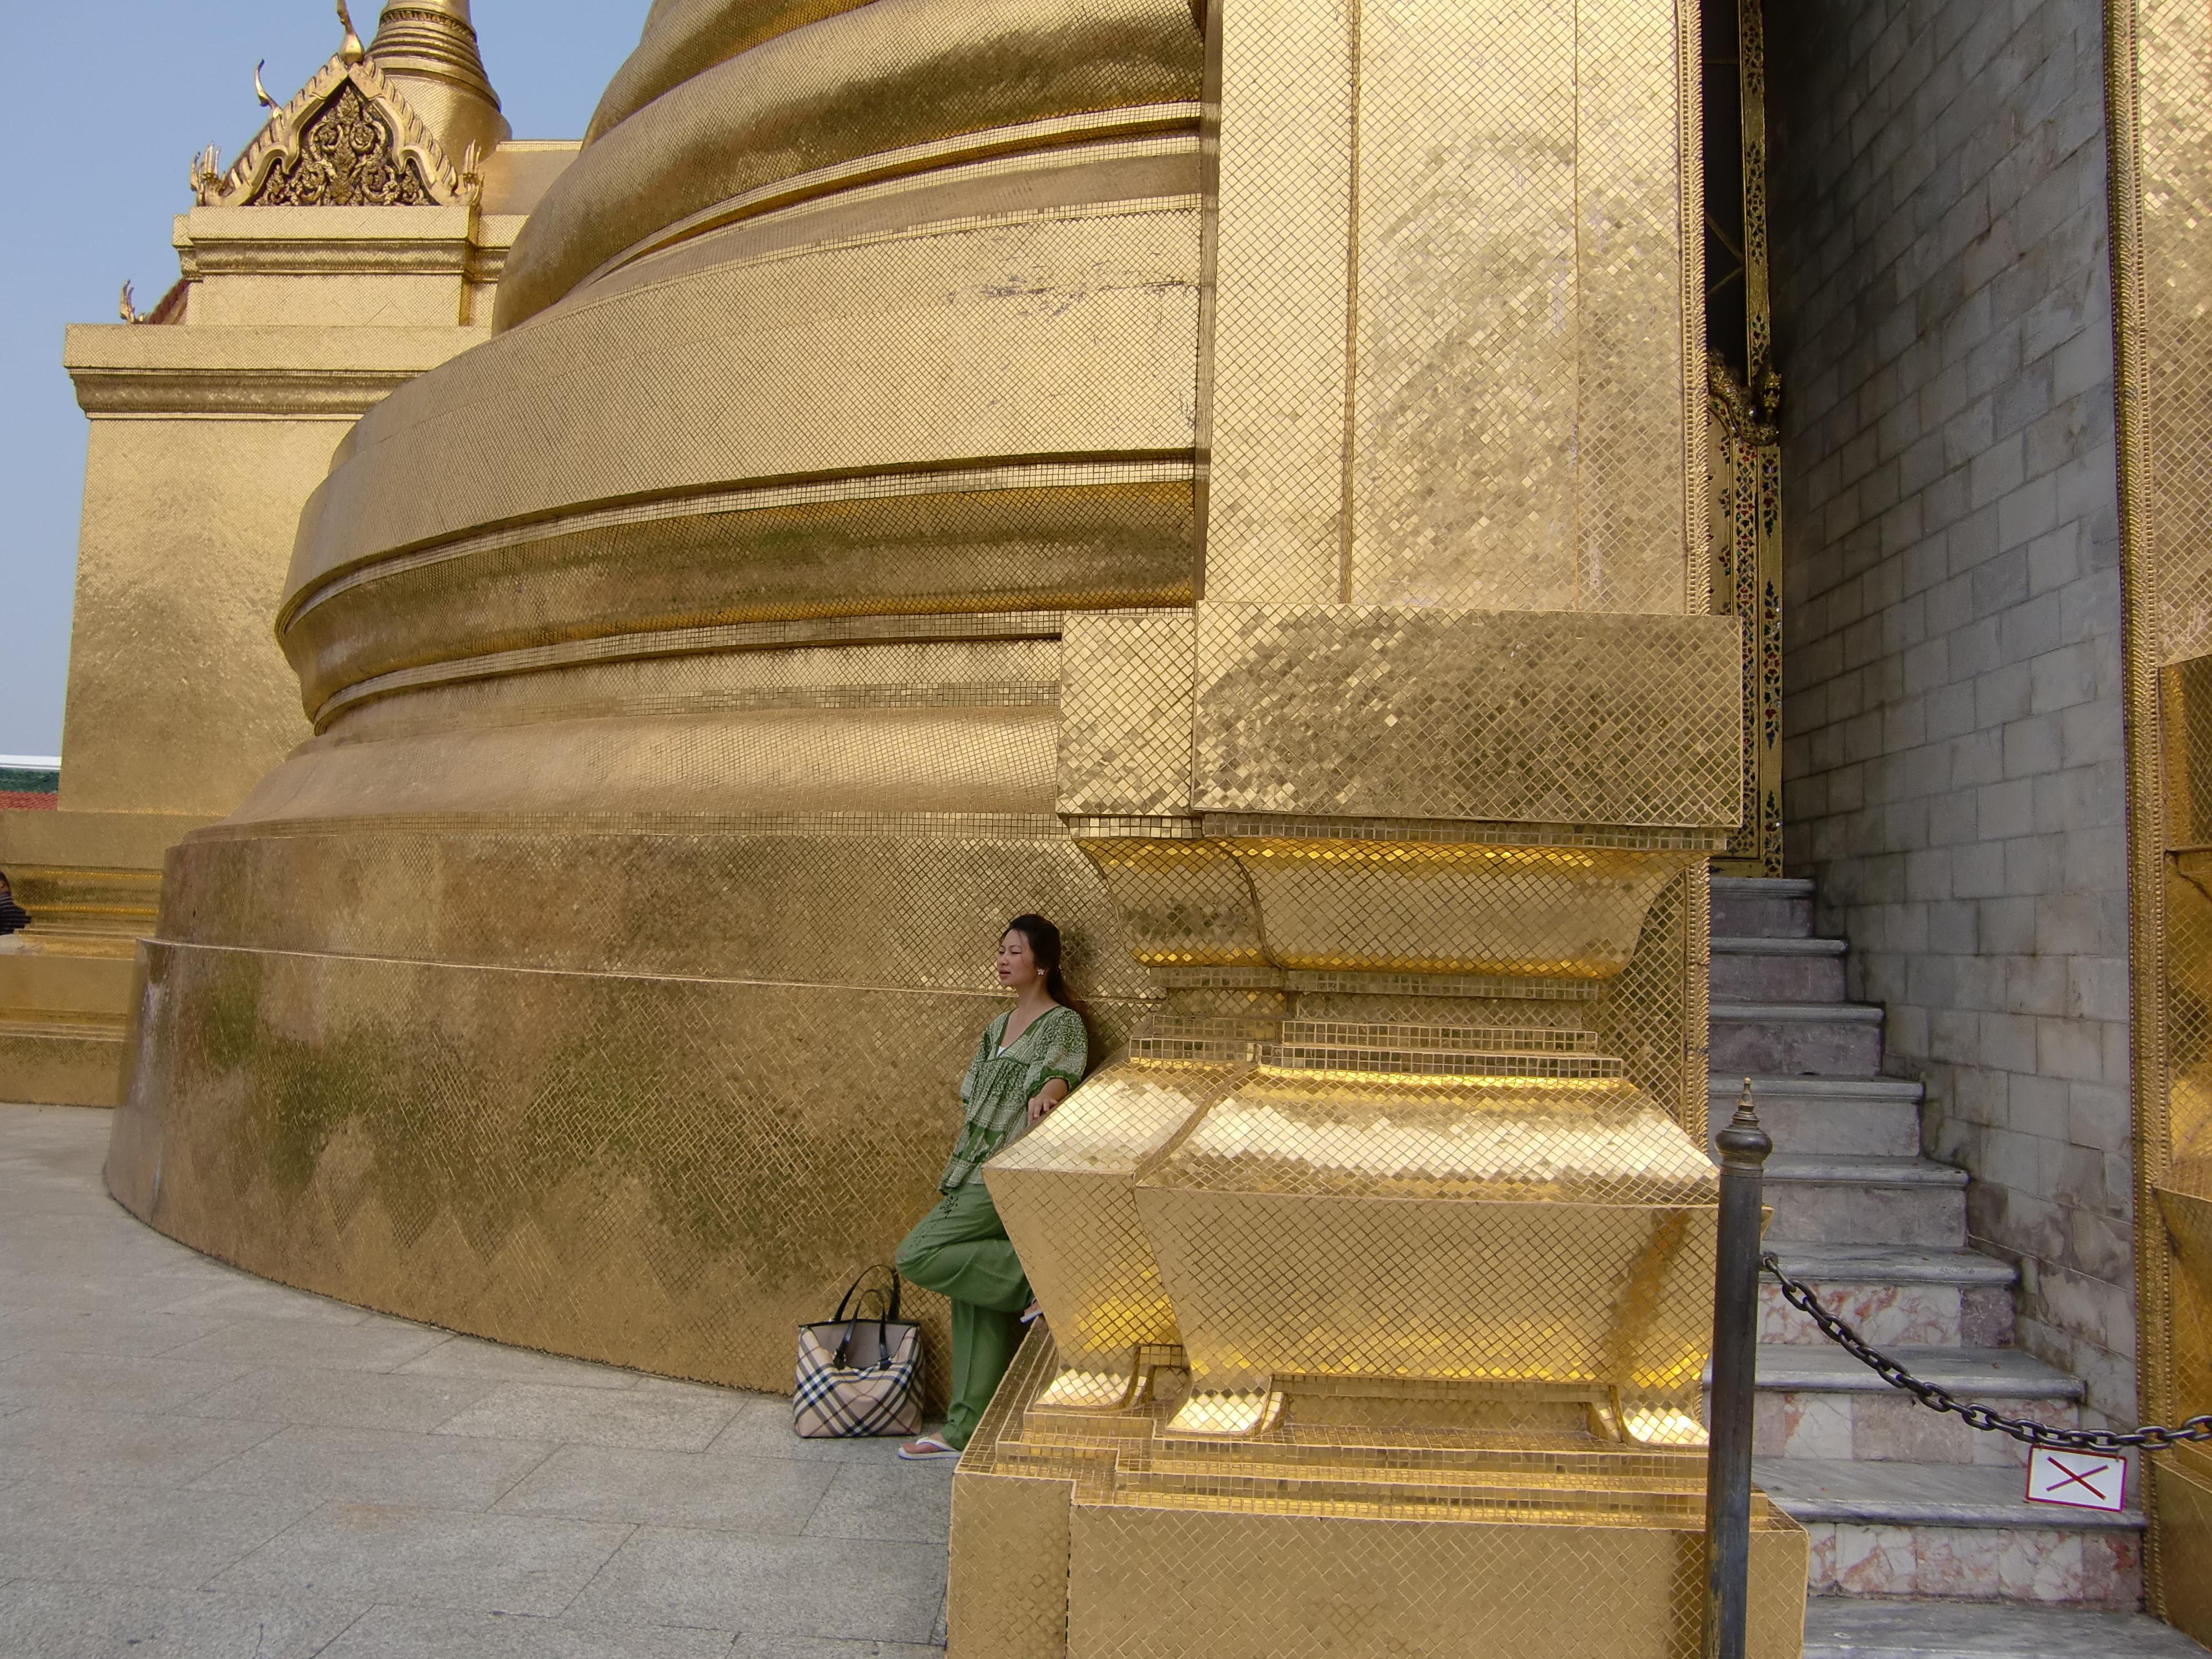 CIMG0048 王宮 pagoda gold gilded